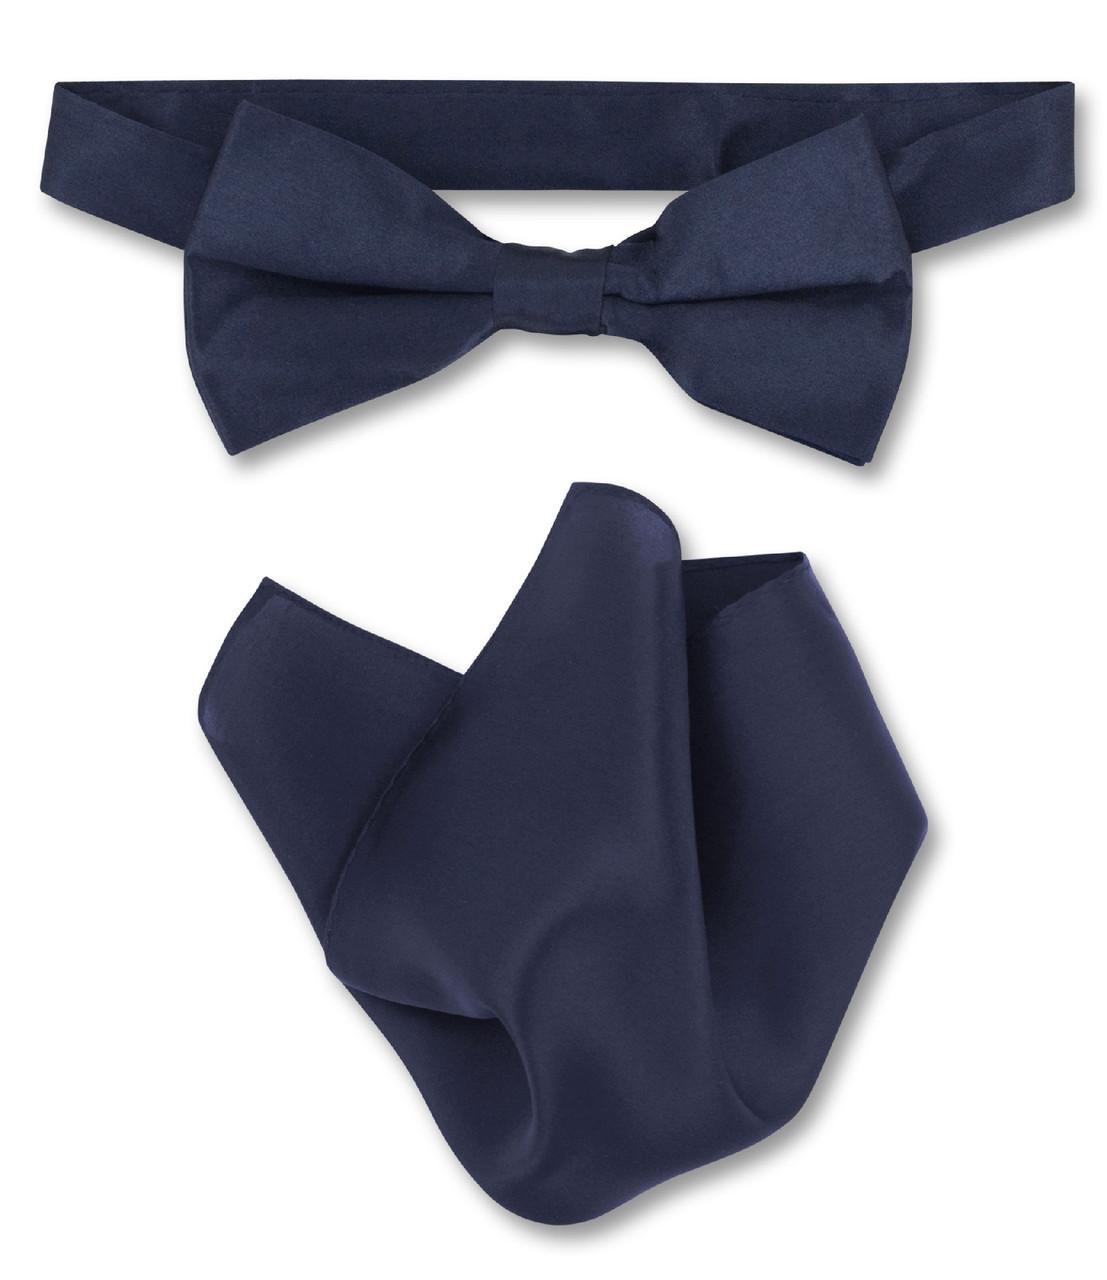 23fab72cd8af Navy Blue Bow Tie Handkerchief Set | Silk BowTie And Hanky Set